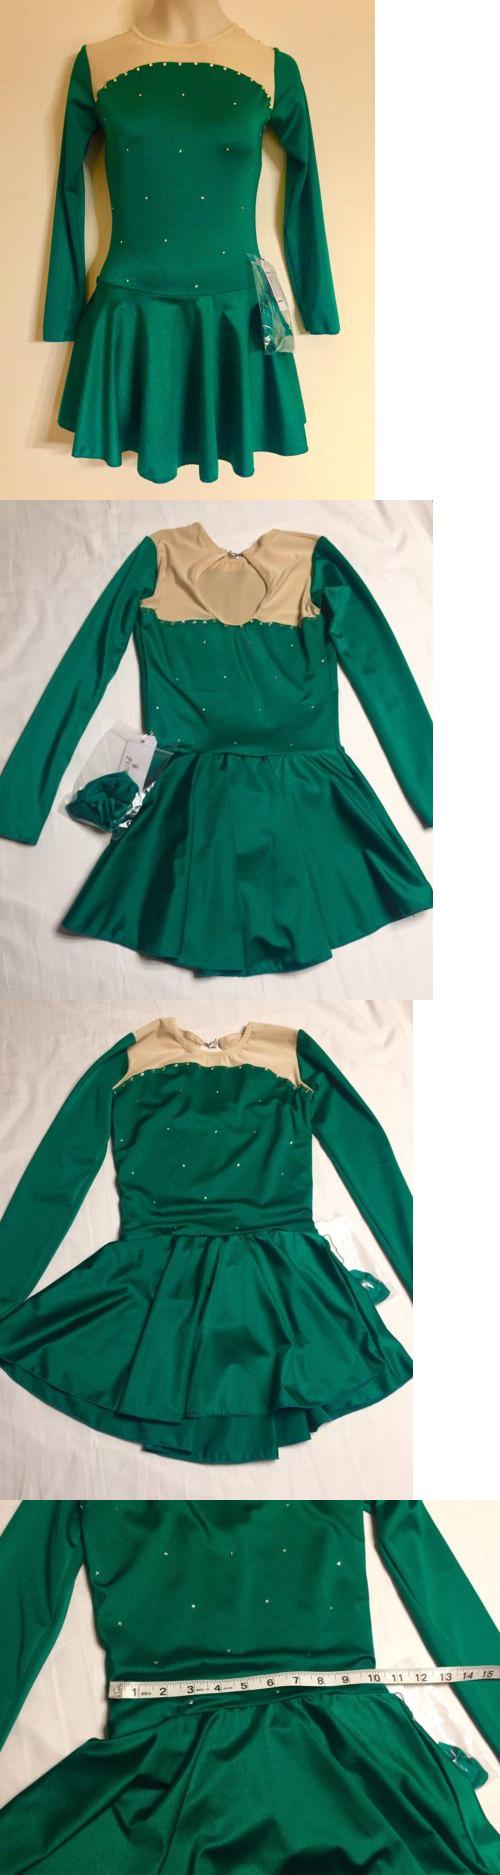 Skating Dresses-Girls 21226: Figure Skating New Dress Child 8 M Green Nwt Ice Christmas Swarovski Crystals -> BUY IT NOW ONLY: $59.99 on eBay!